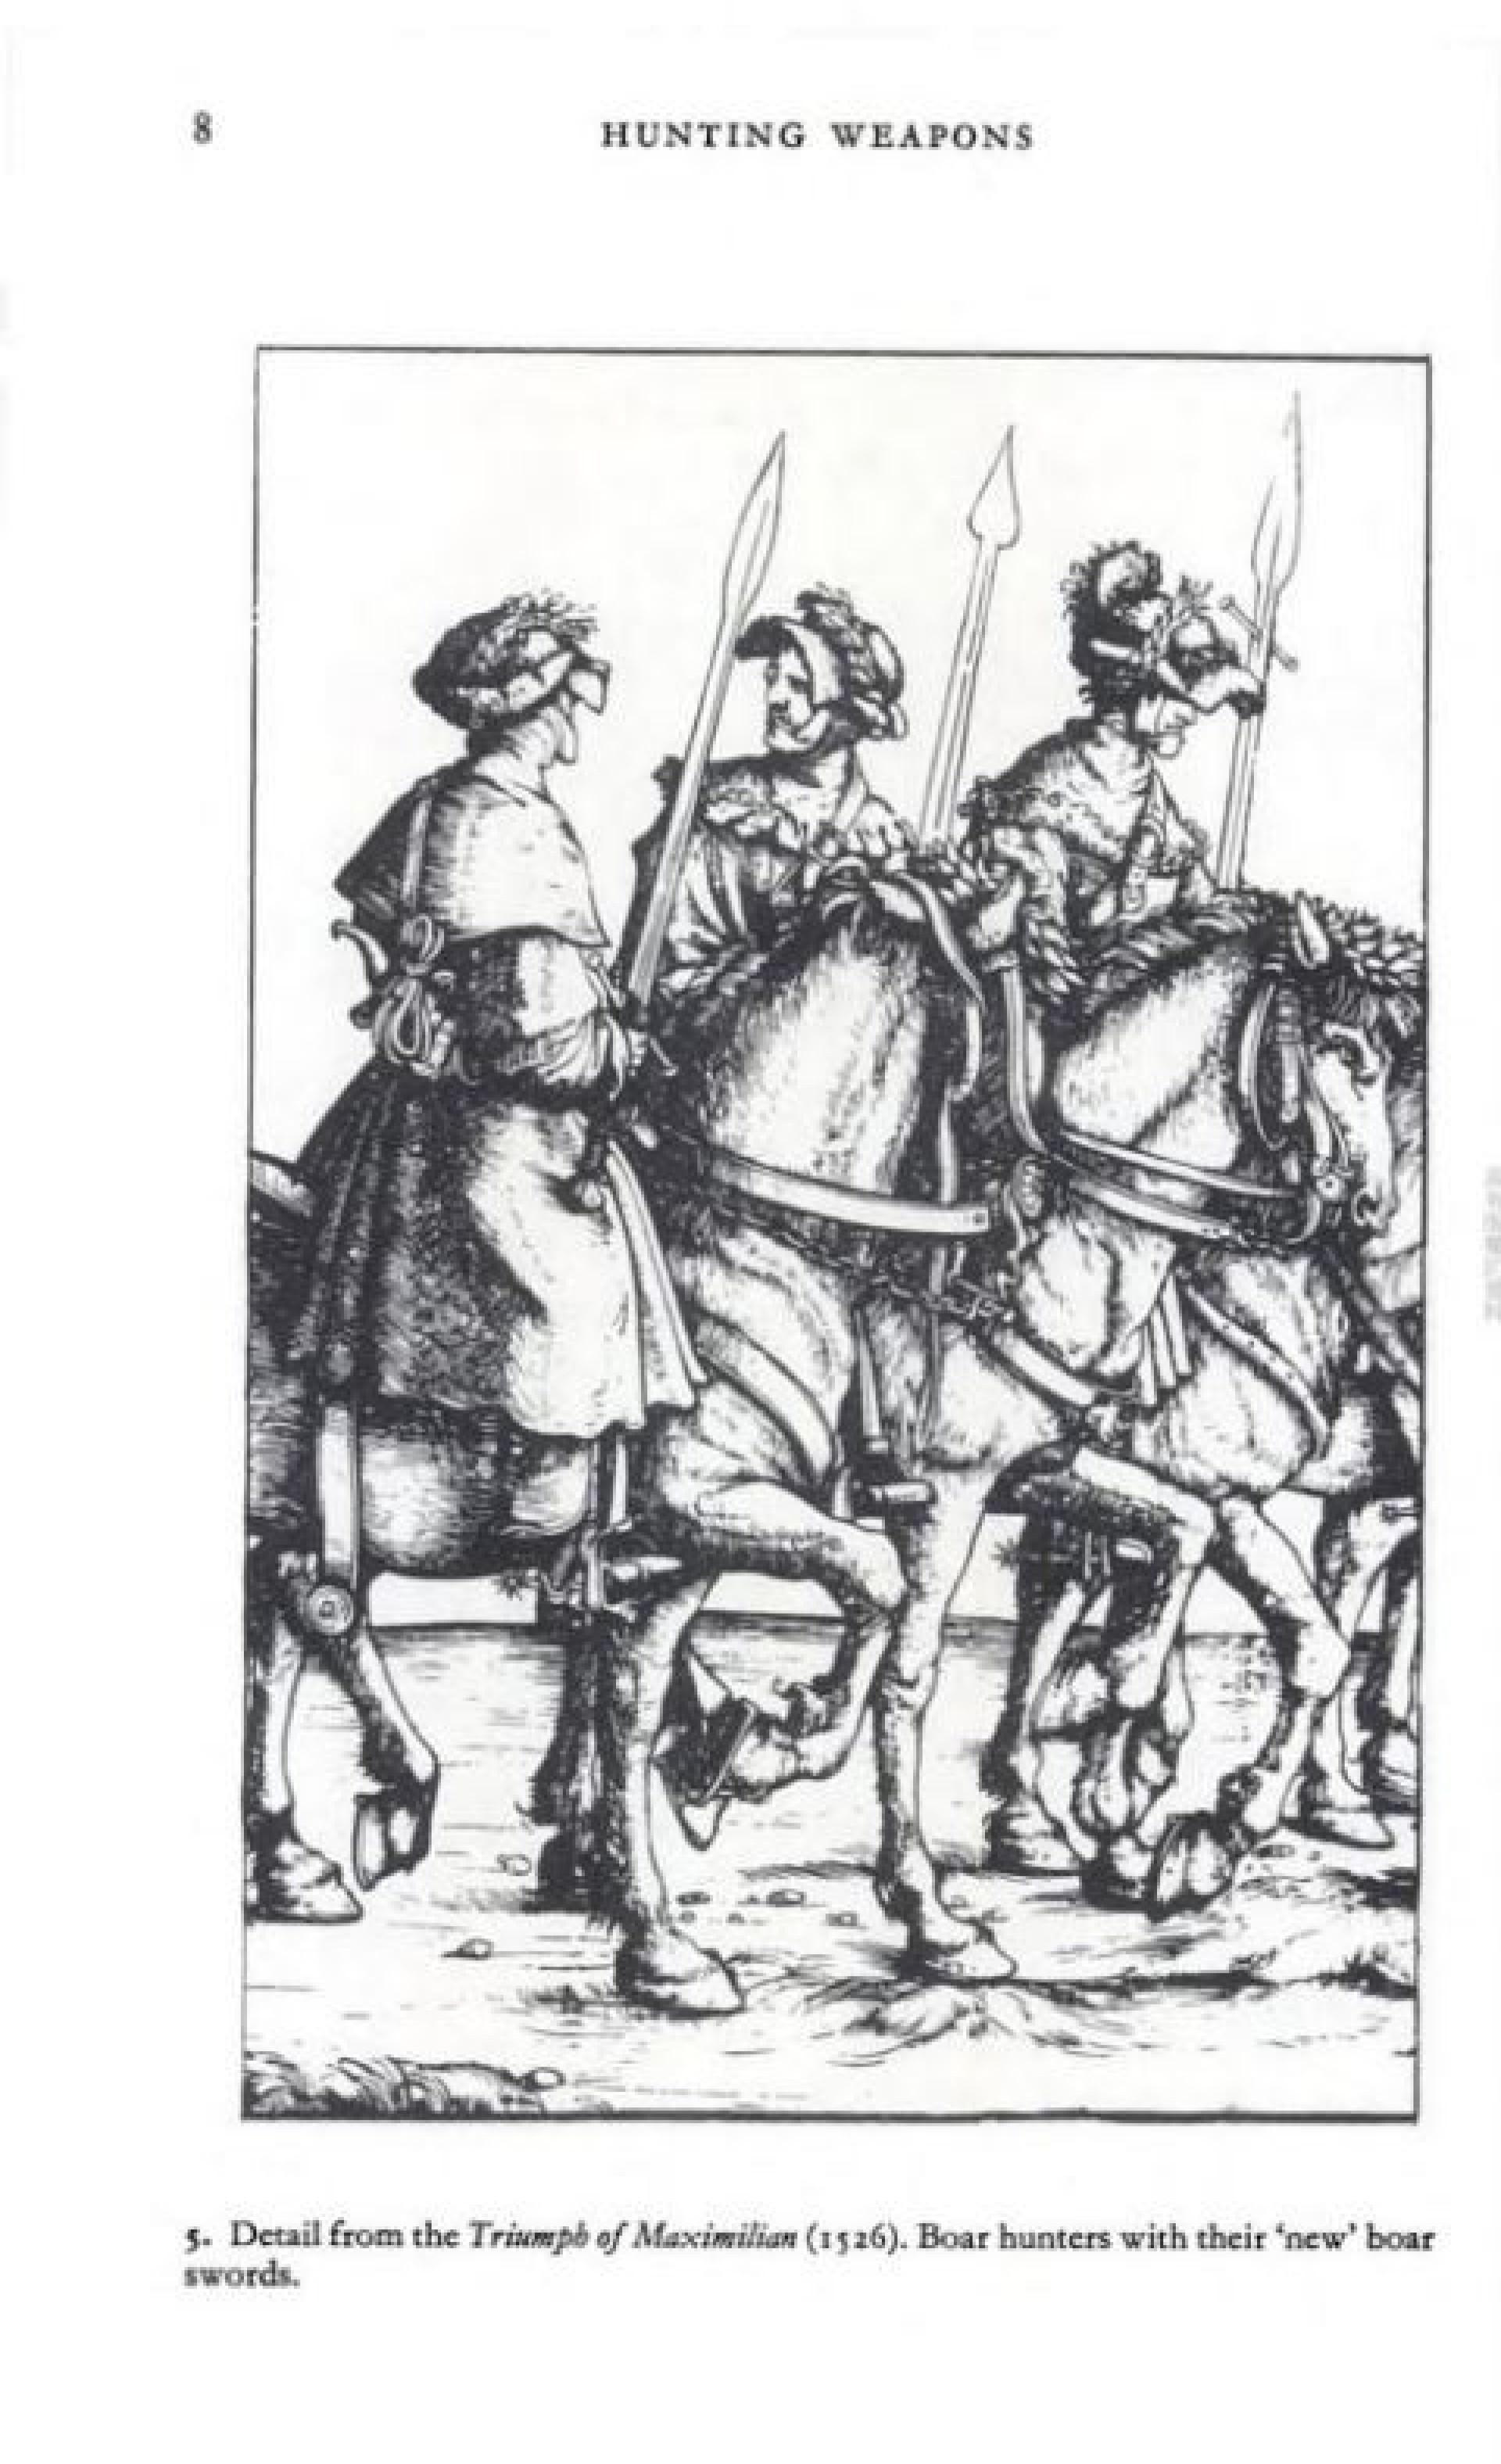 Boar sword則是15世紀的產物,Estoc這種長型刺劍比起闊兵刃的劍更適合打獵(可抵禦更大衝擊),但有可能會插得太入,令獵物太接近獵人而造成危險,因此Boar sword就在劍刃位置加上像boar spear的「翼」,用來「卡住」獵物。(《Hunting Weapons: From the Middle Ages to the Twentieth Century》,Howard L. Blackmore ,P.8)